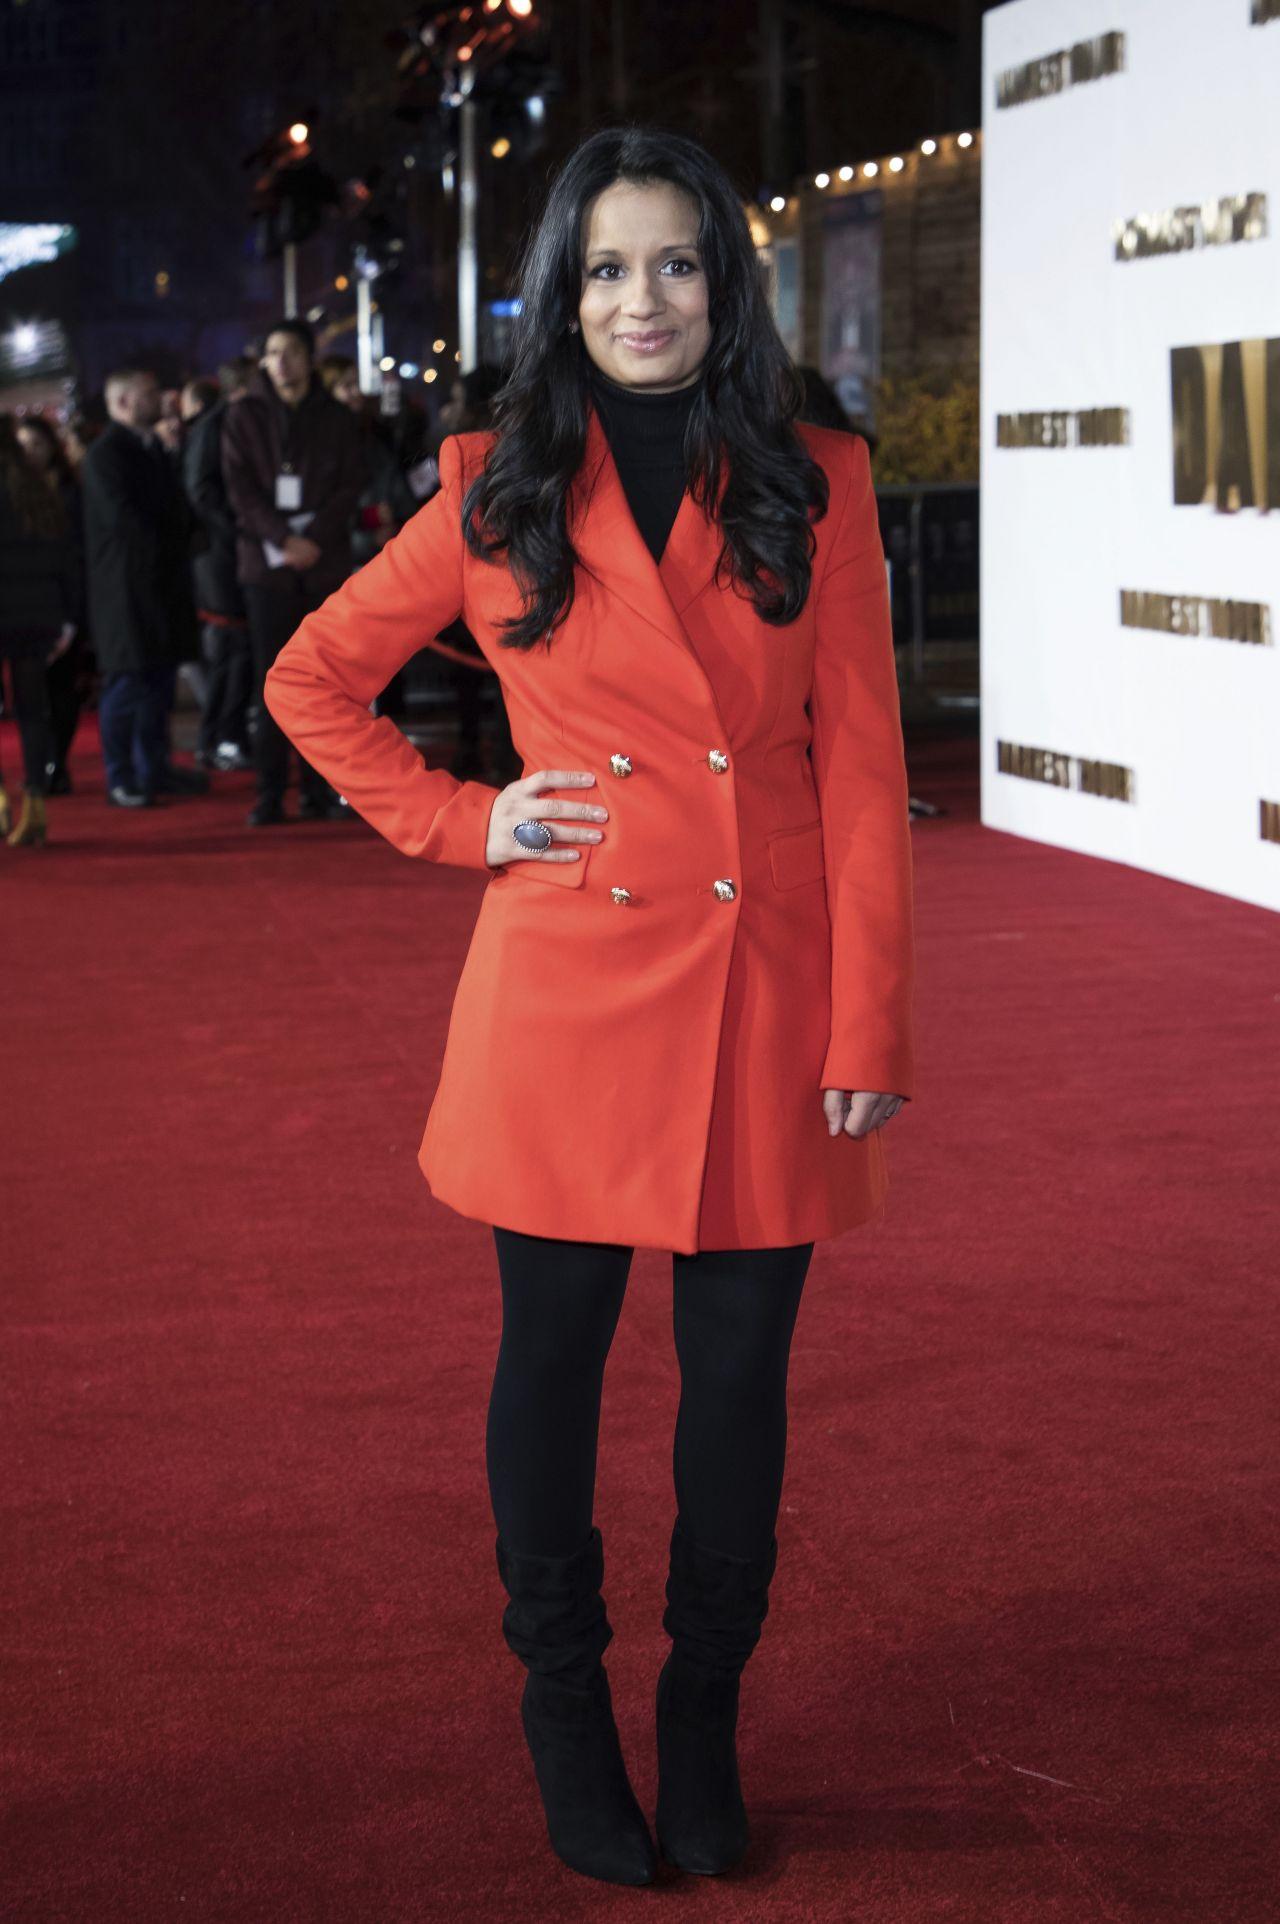 Sonali Shah Darkest Hour Premiere In London